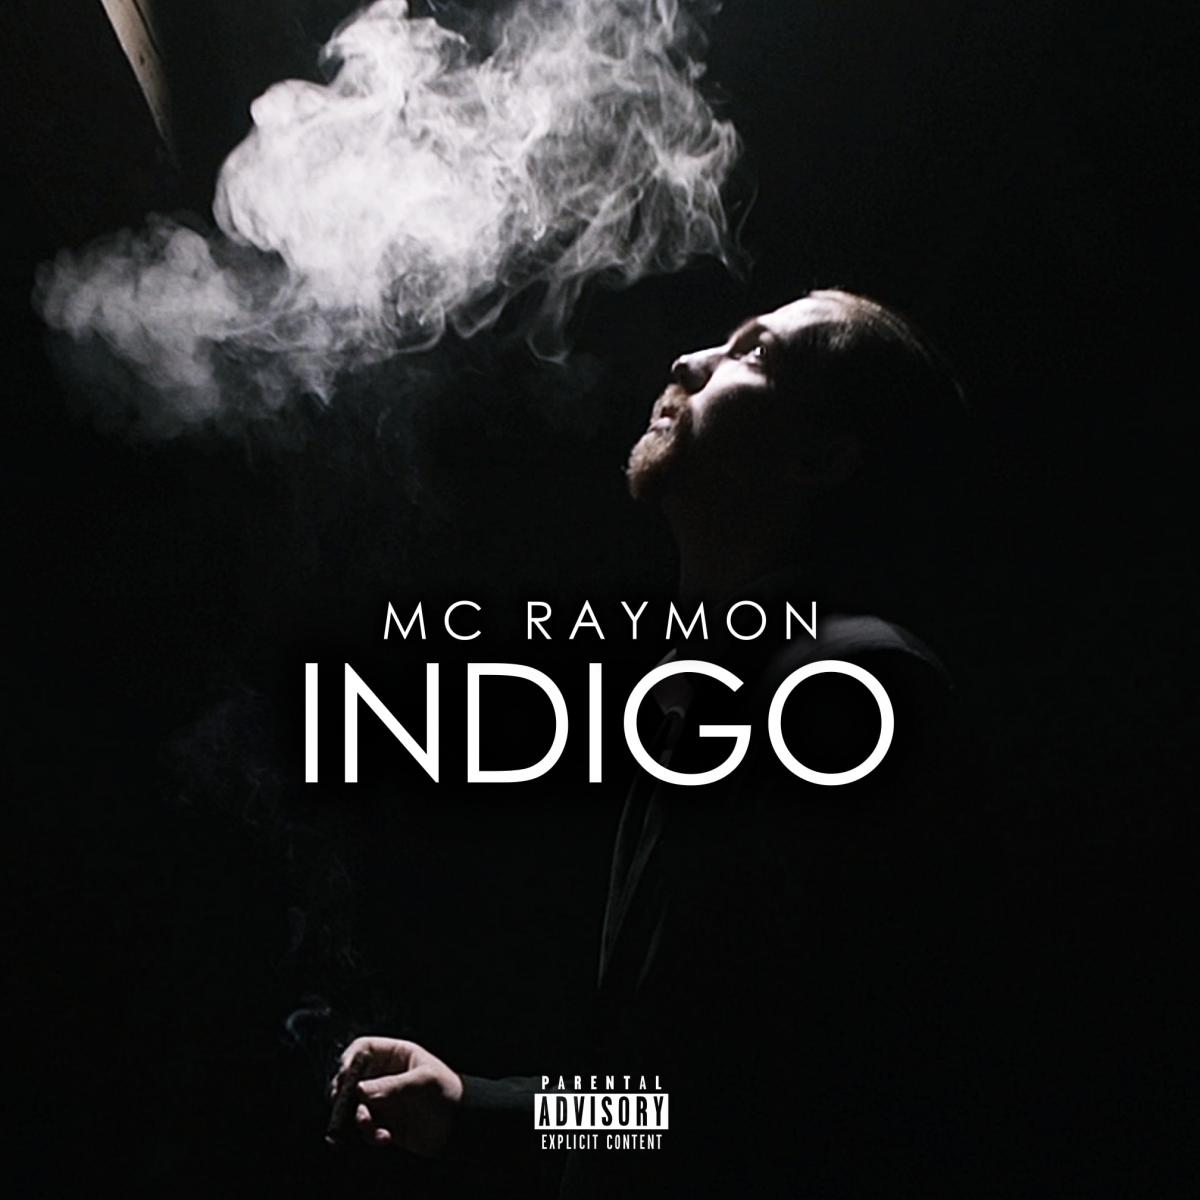 Upcoming: MC Raymon - Indigo